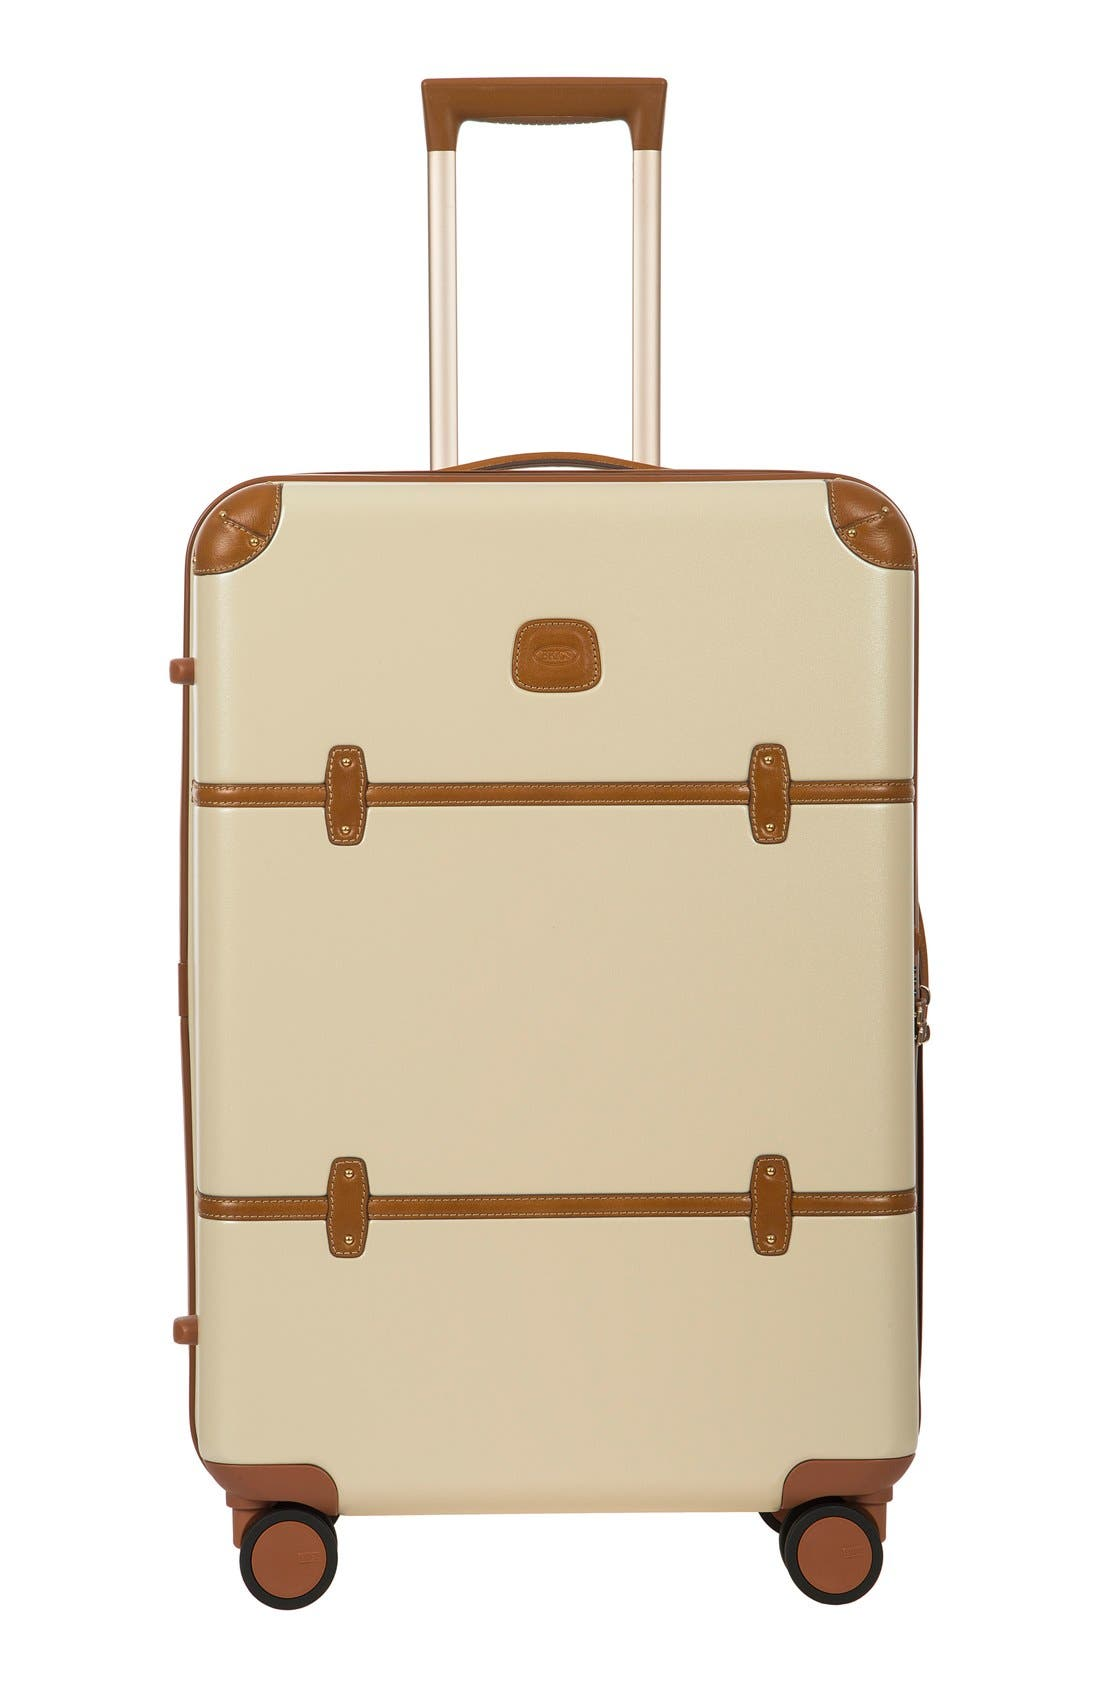 BRICS Bellagio 2.0 27 Inch Rolling Spinner Suitcase